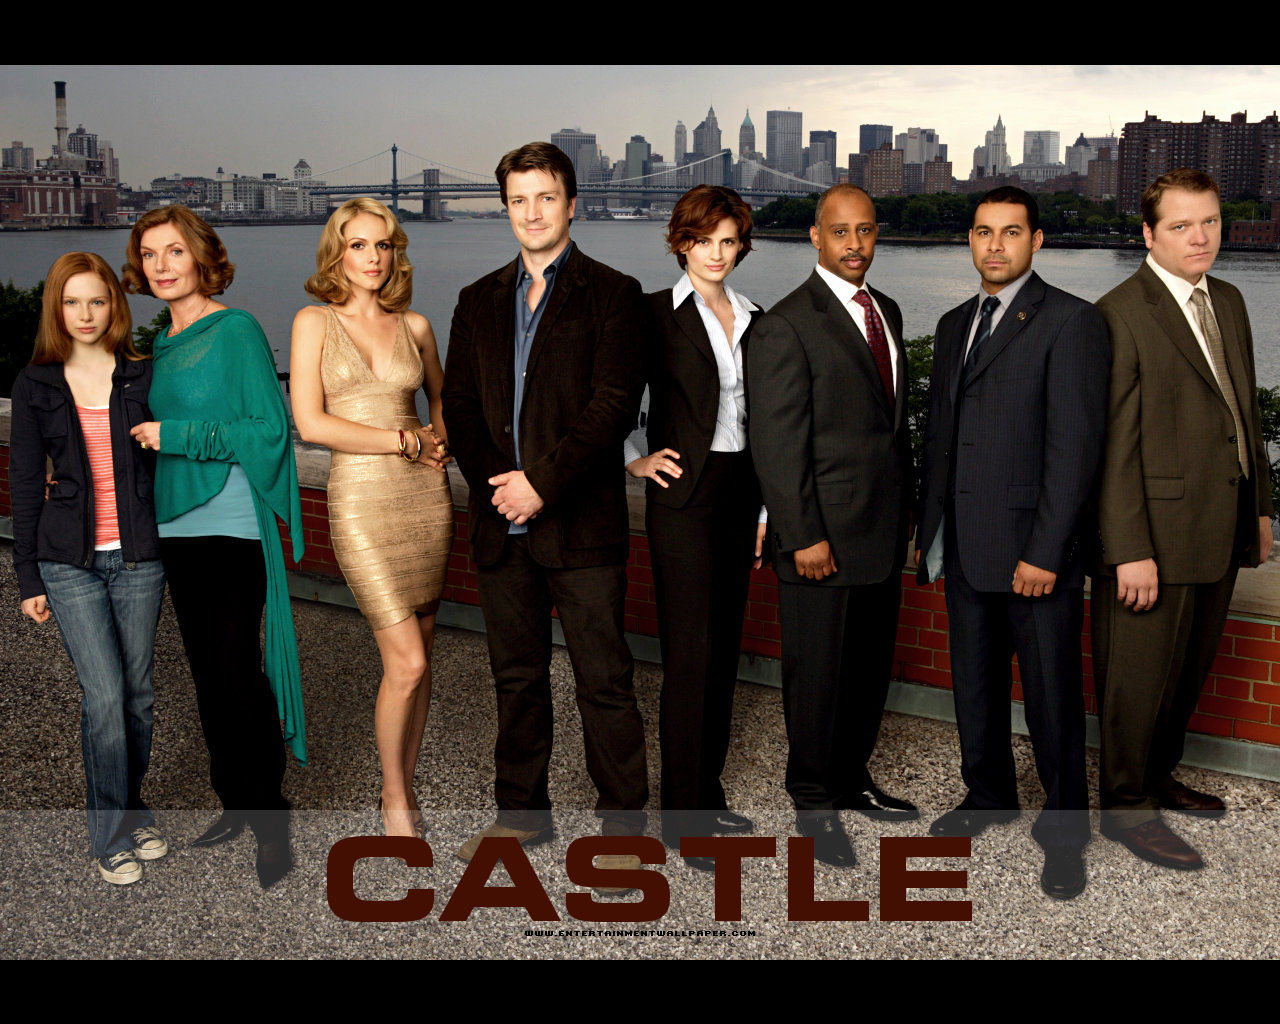 Castel Serie